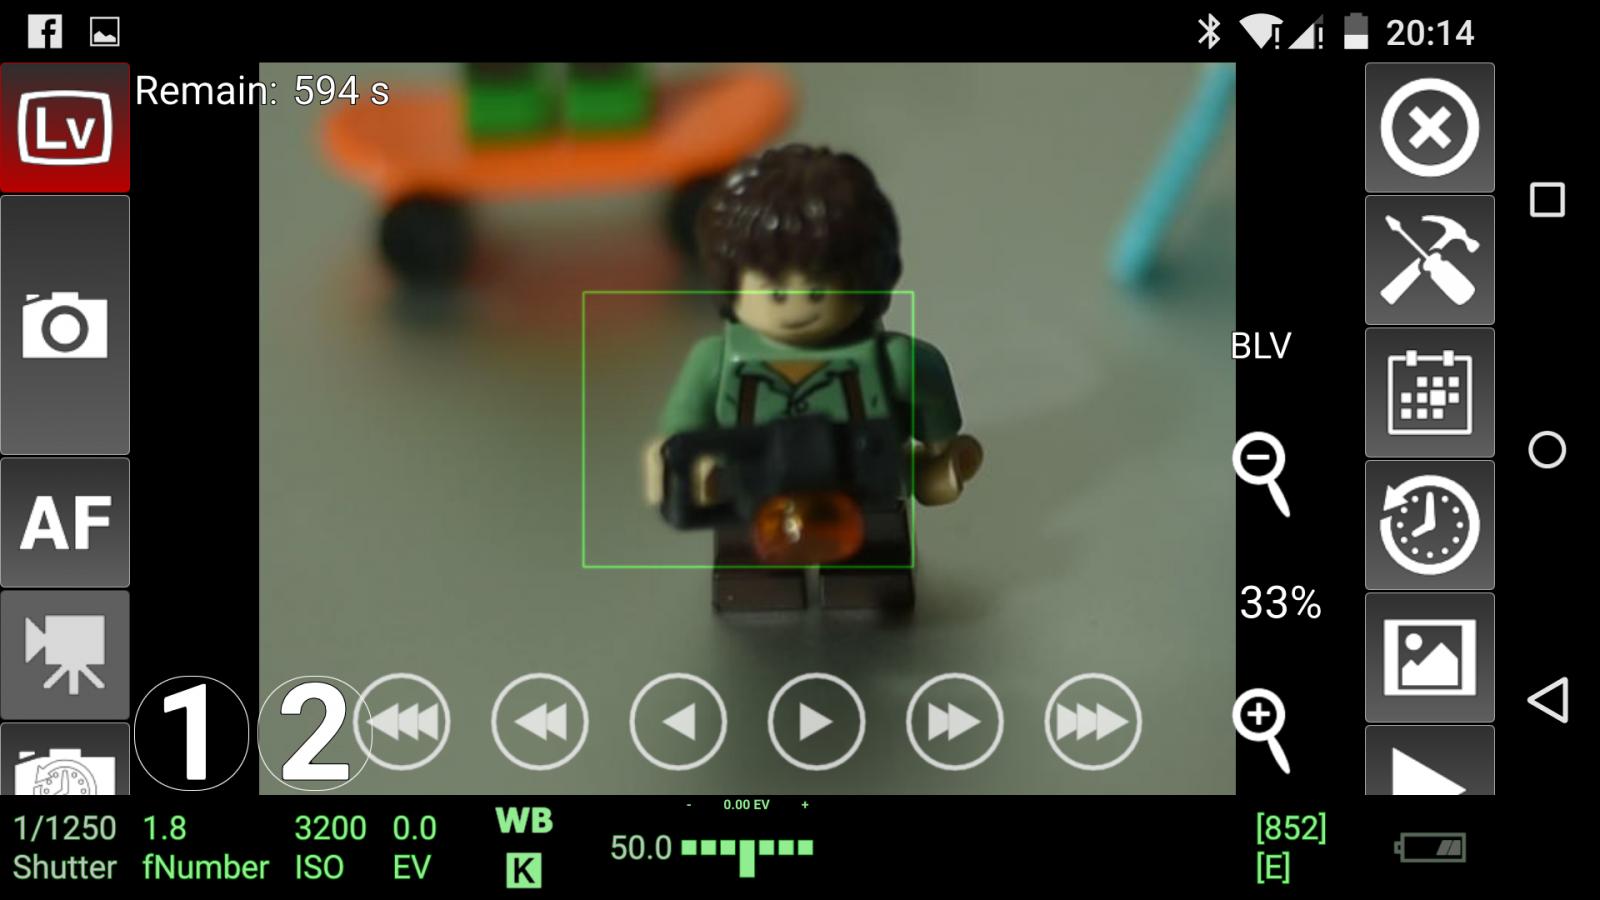 qdslrdashboard-nikon-remote-control-app-android